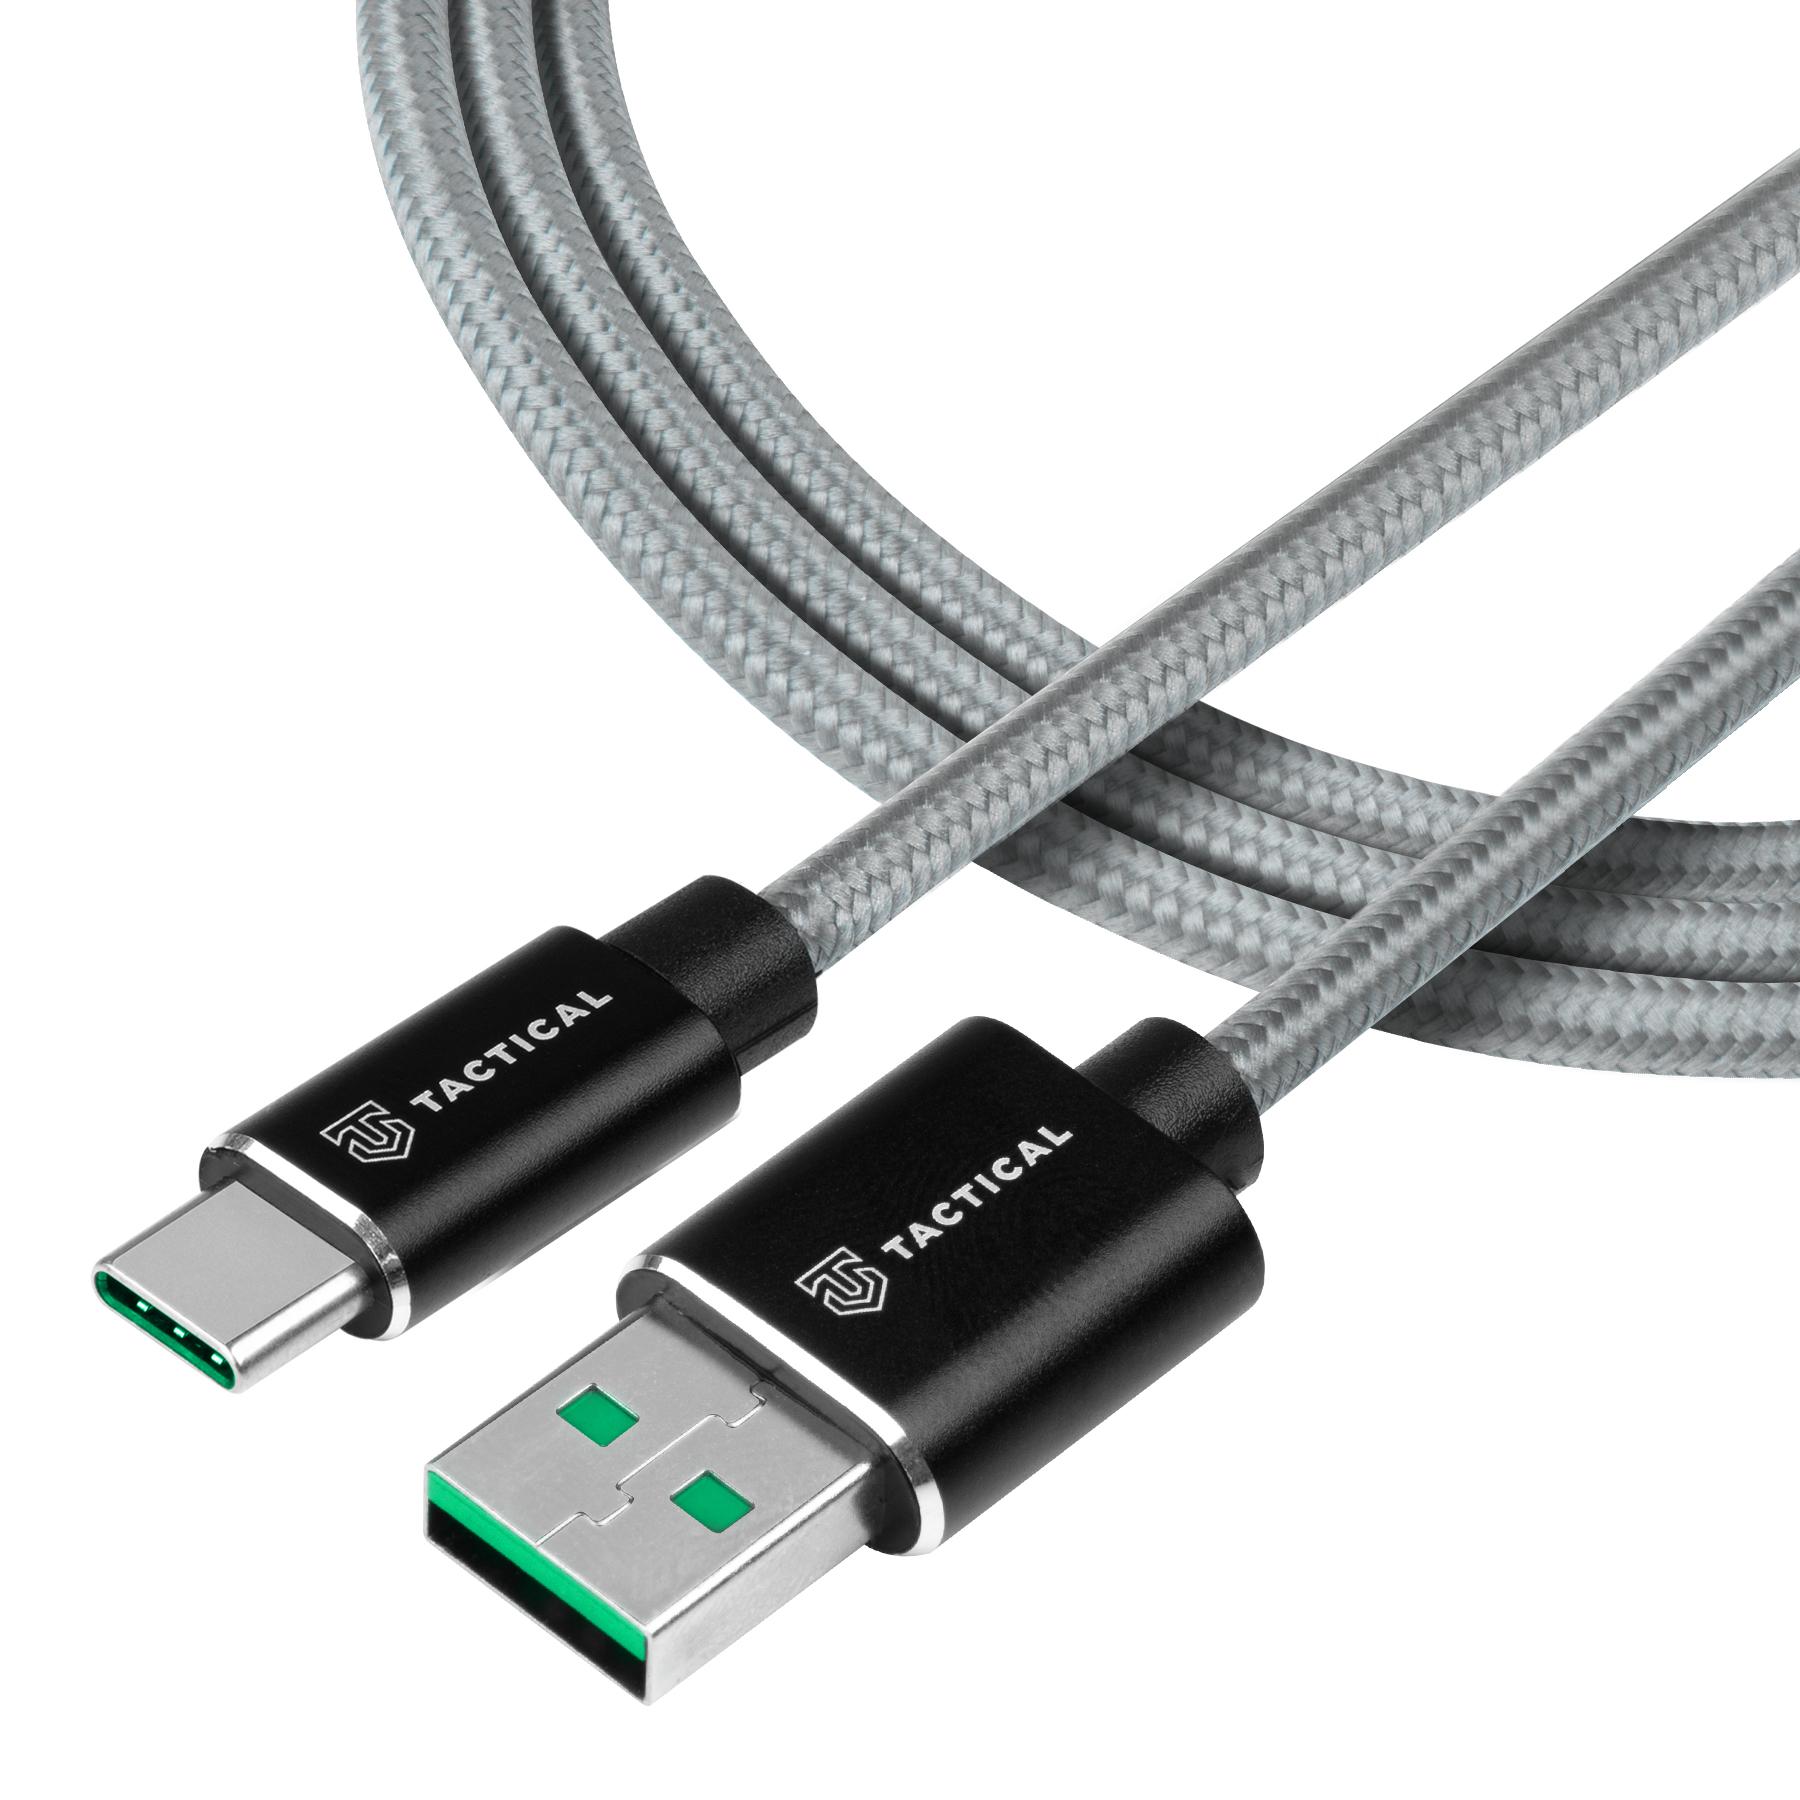 Tactical Fast Rope Aramid Cable USB-A/USB-C - SuperVOOC 2.0 CHARGE 1m Grey 8596311153235